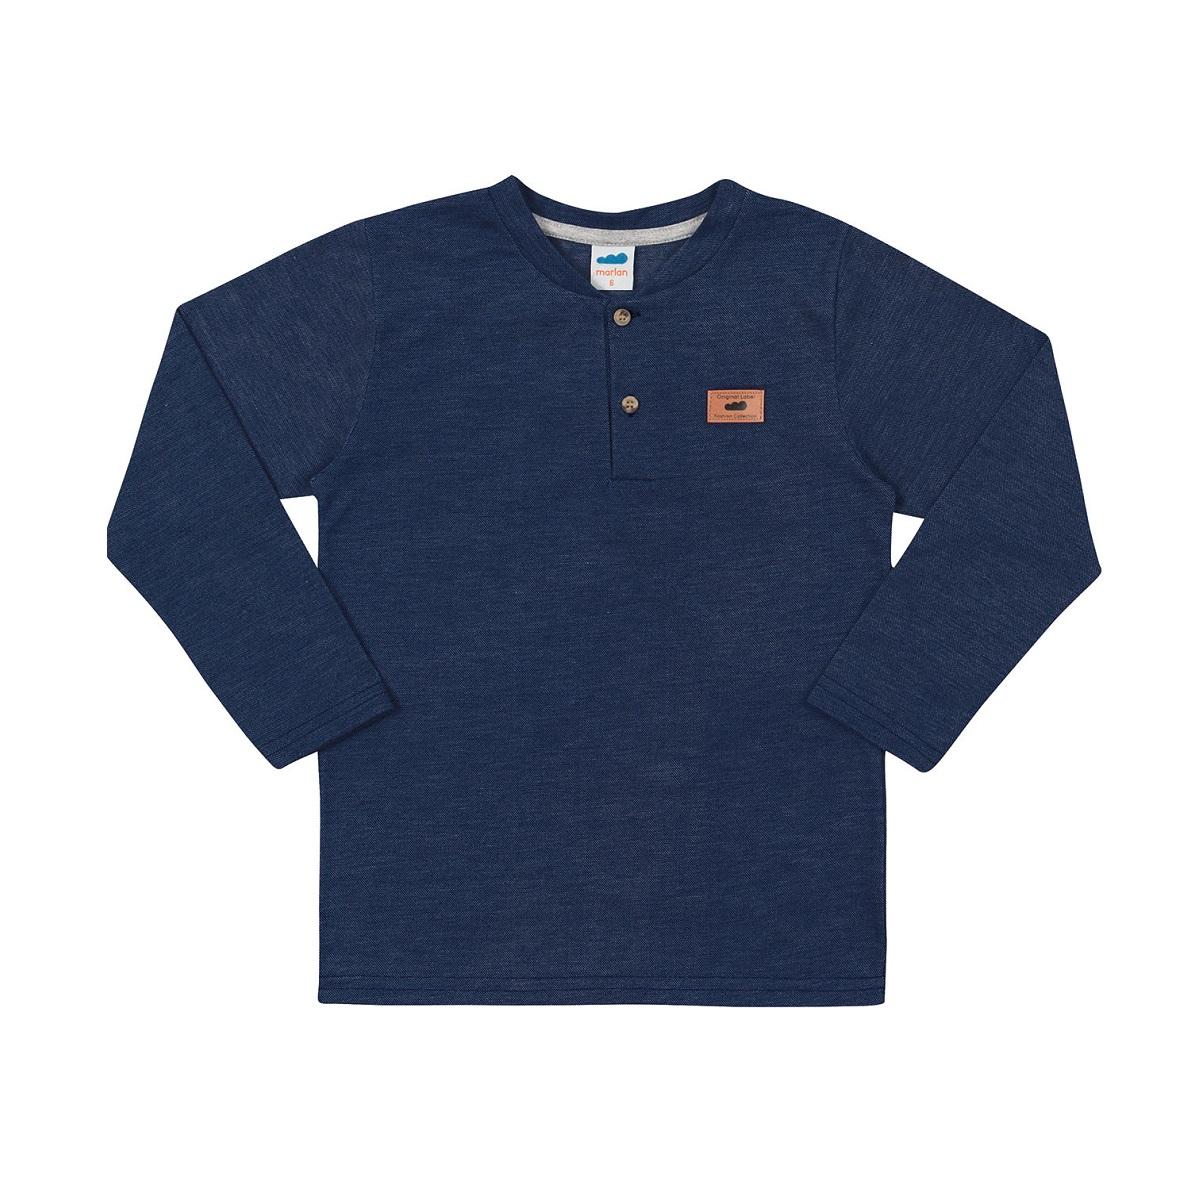 Camiseta Infantil Masculina - MARLAN 24689